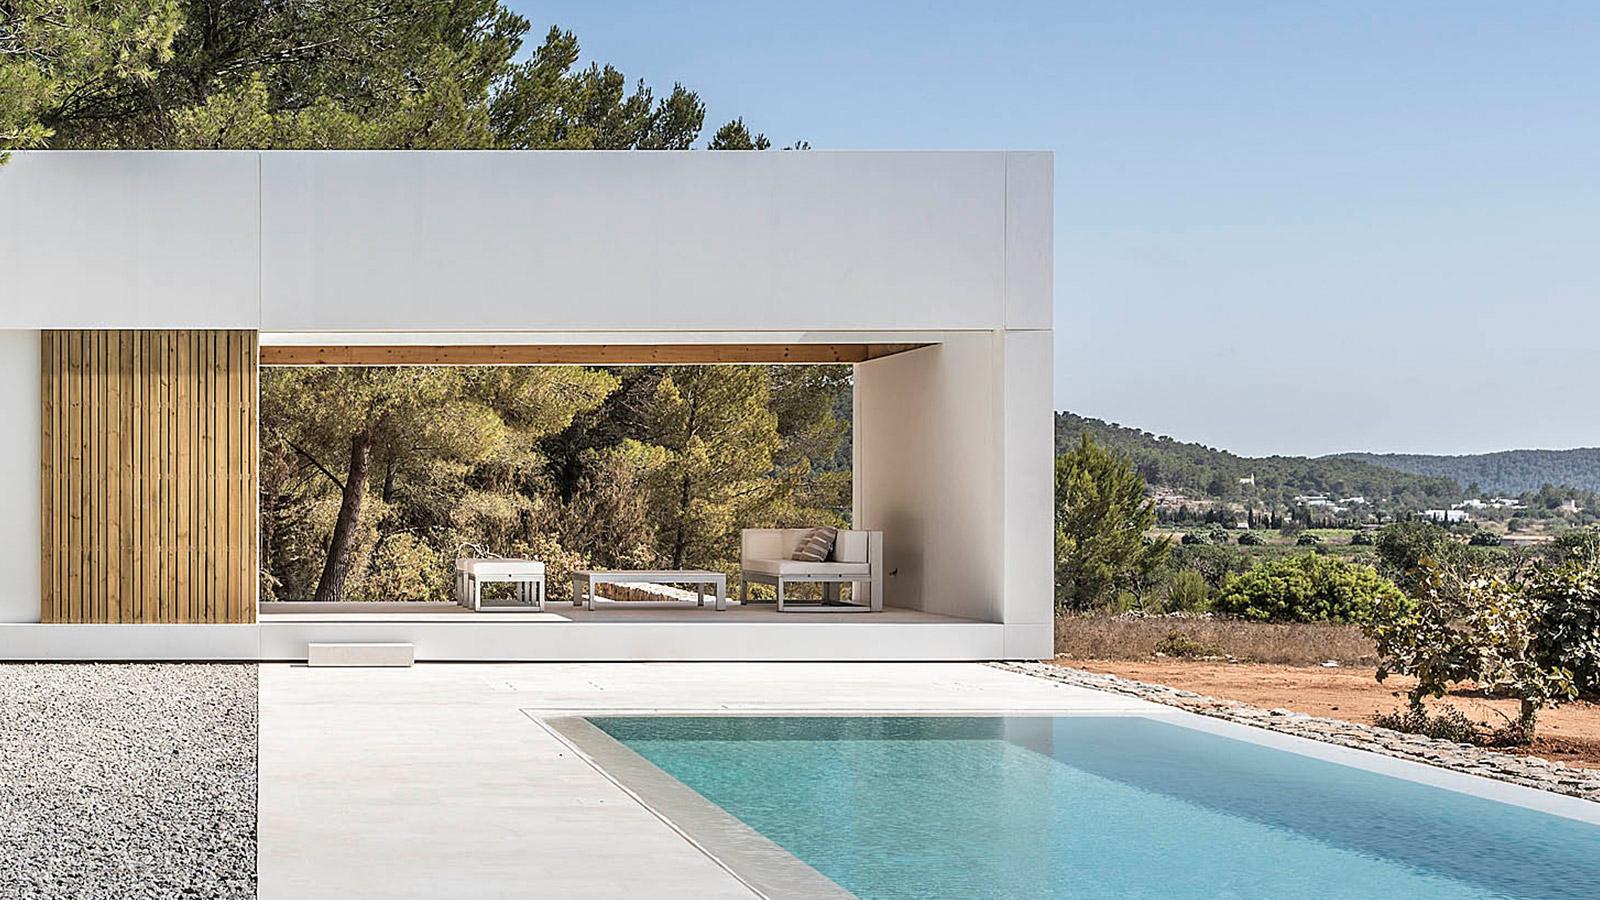 Ca l'Amo by Marià CastellóArchitecture